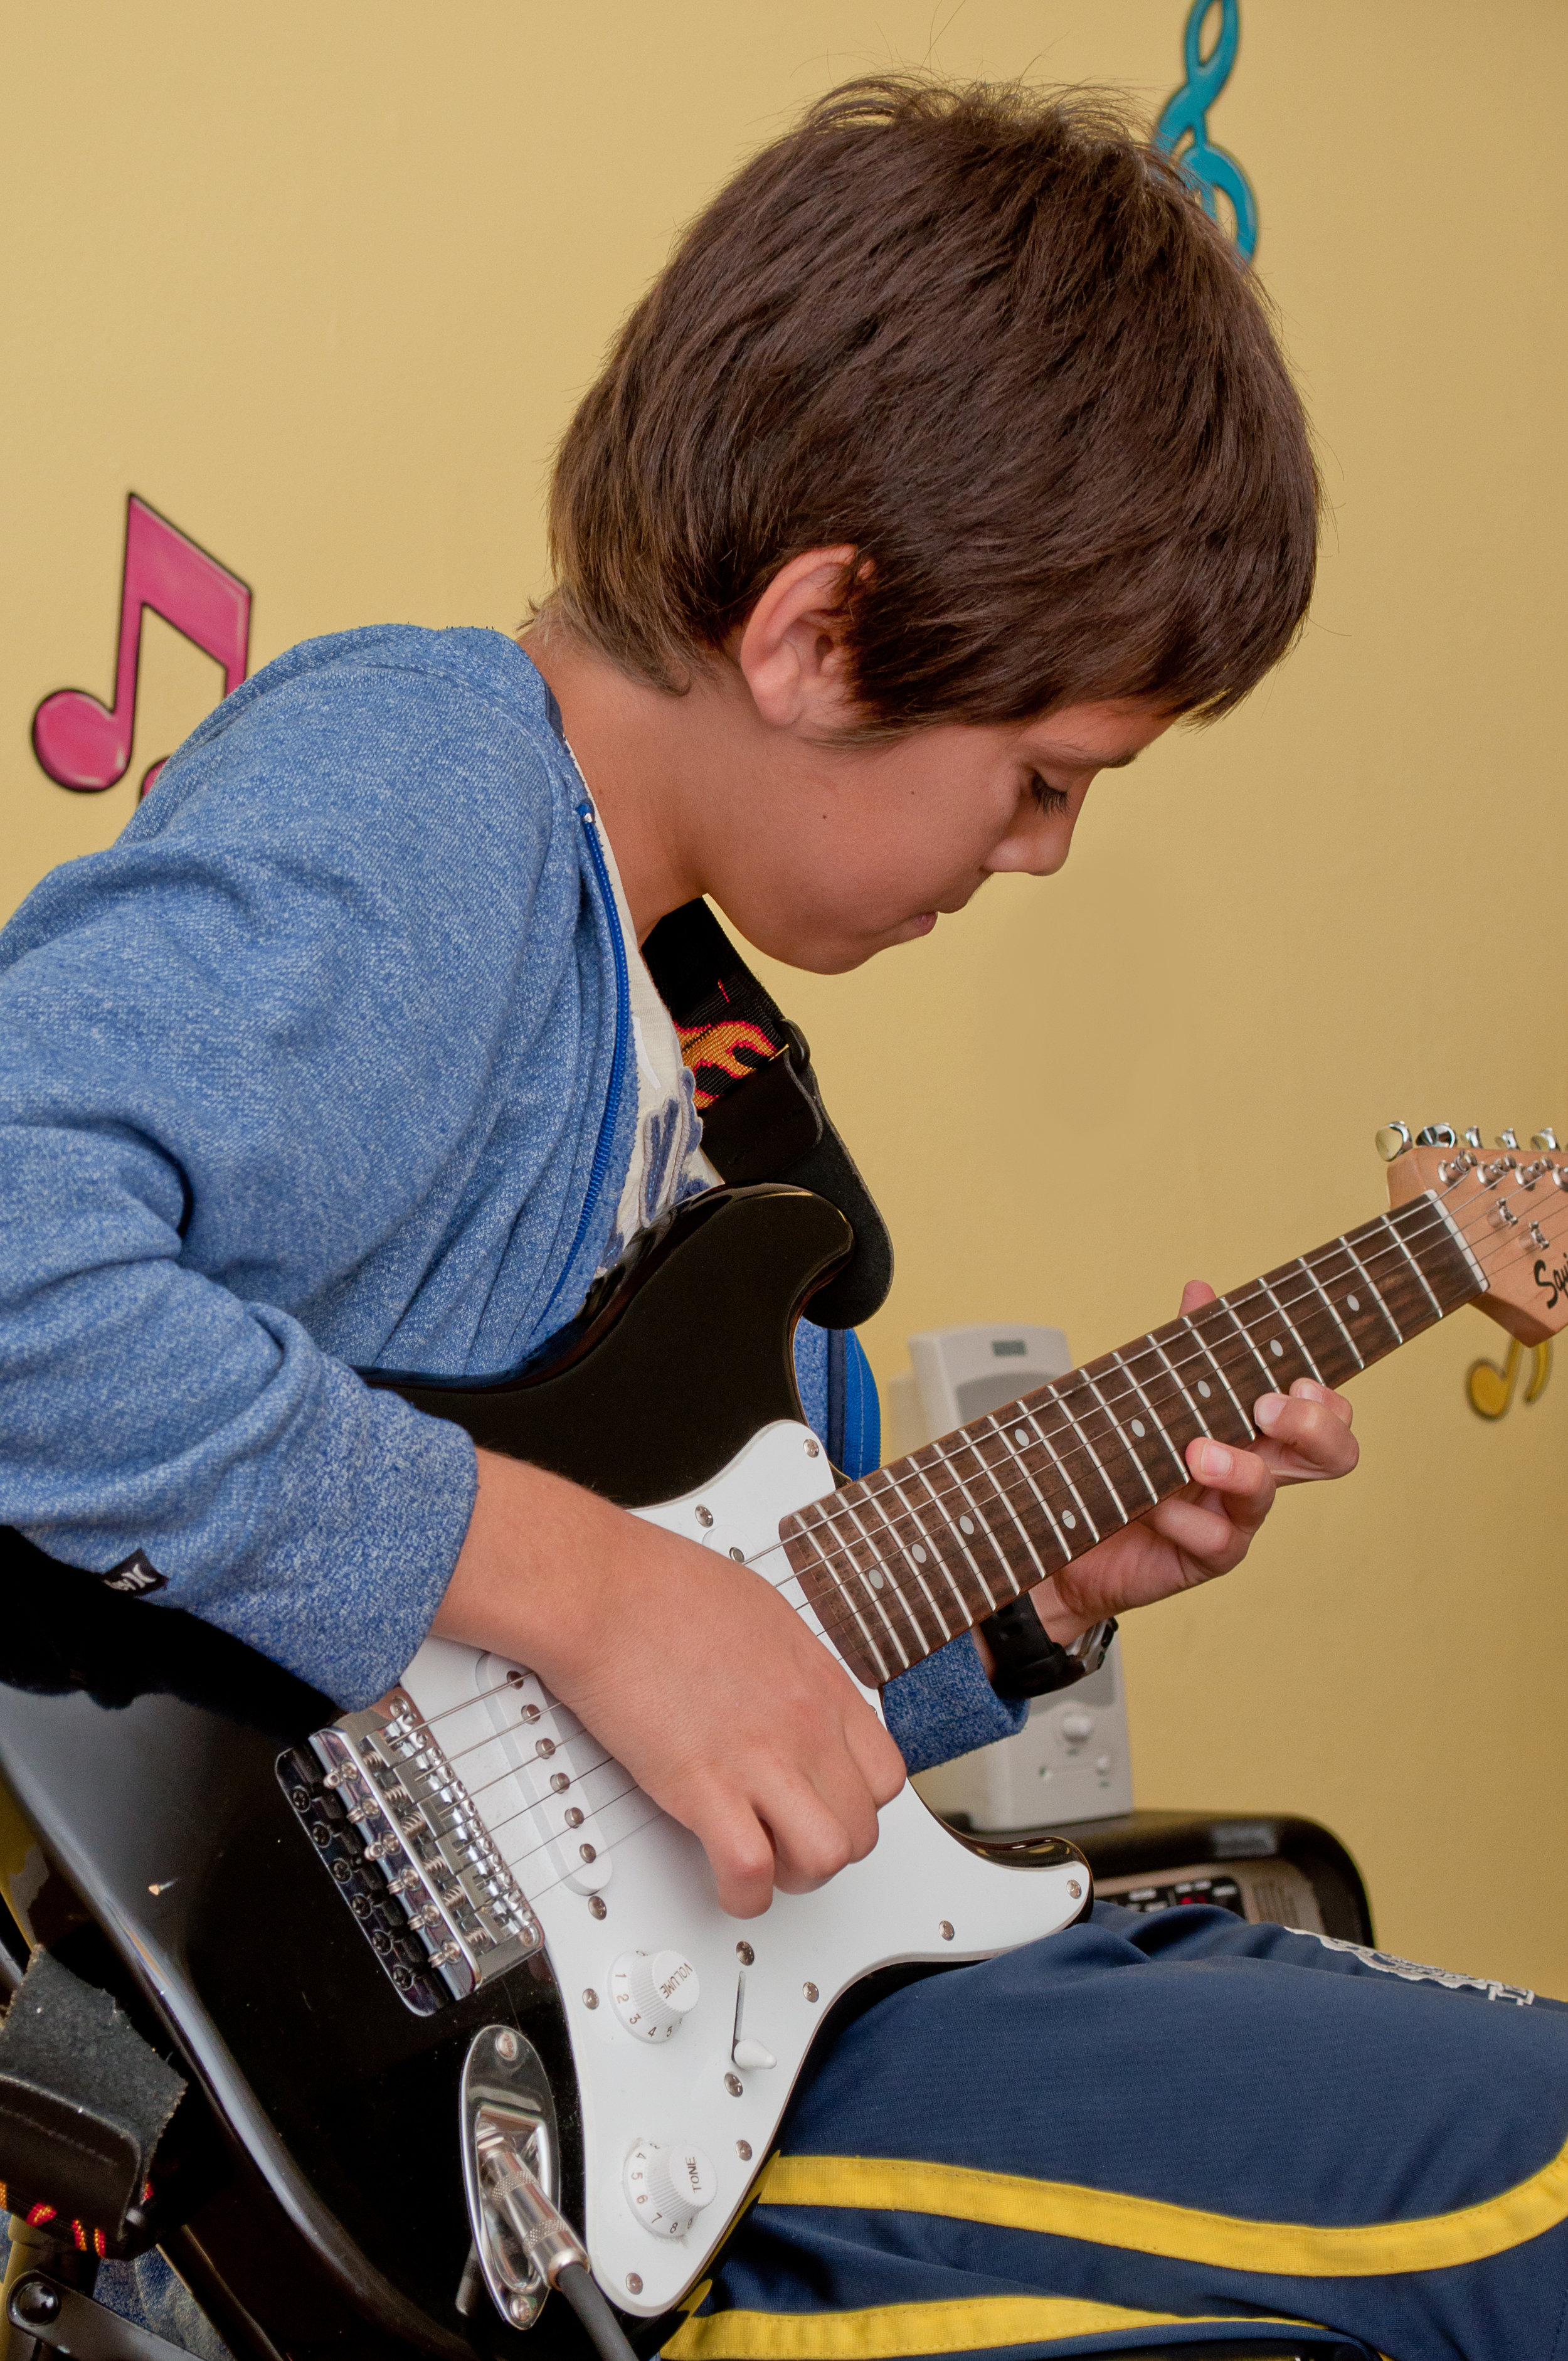 Guitar/Guitarra, ages/años 11-14